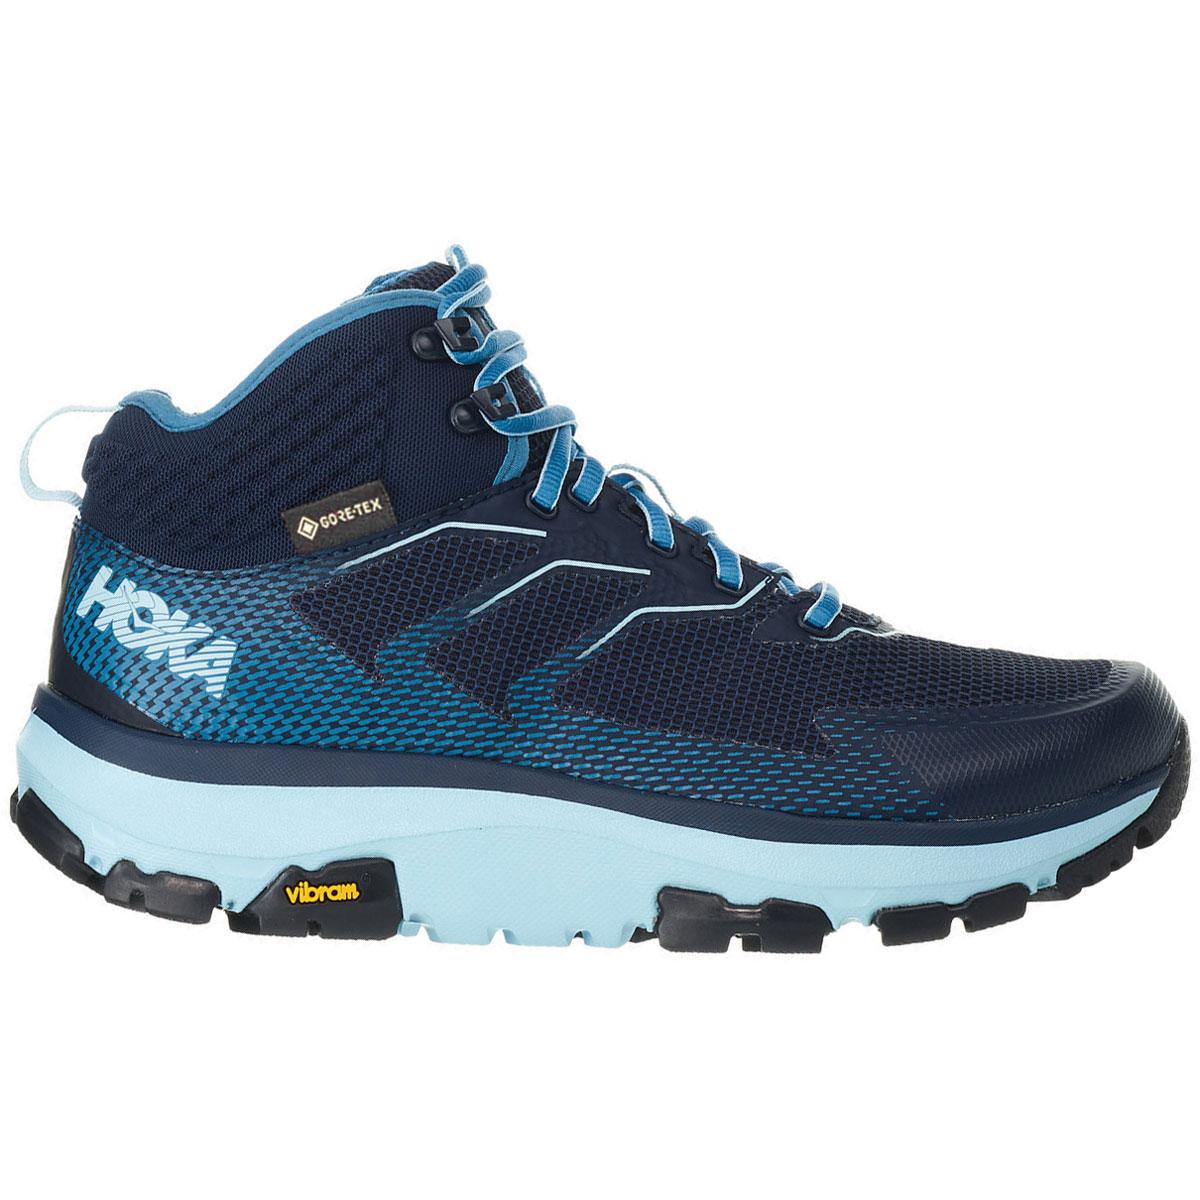 Women's Hoka One One Sky Toa Gore-Tex Trail Running Shoe - Color: Black Iris/Aquamarine - Size: 5 - Width: Regular, Black Iris/Aquamarine, large, image 1